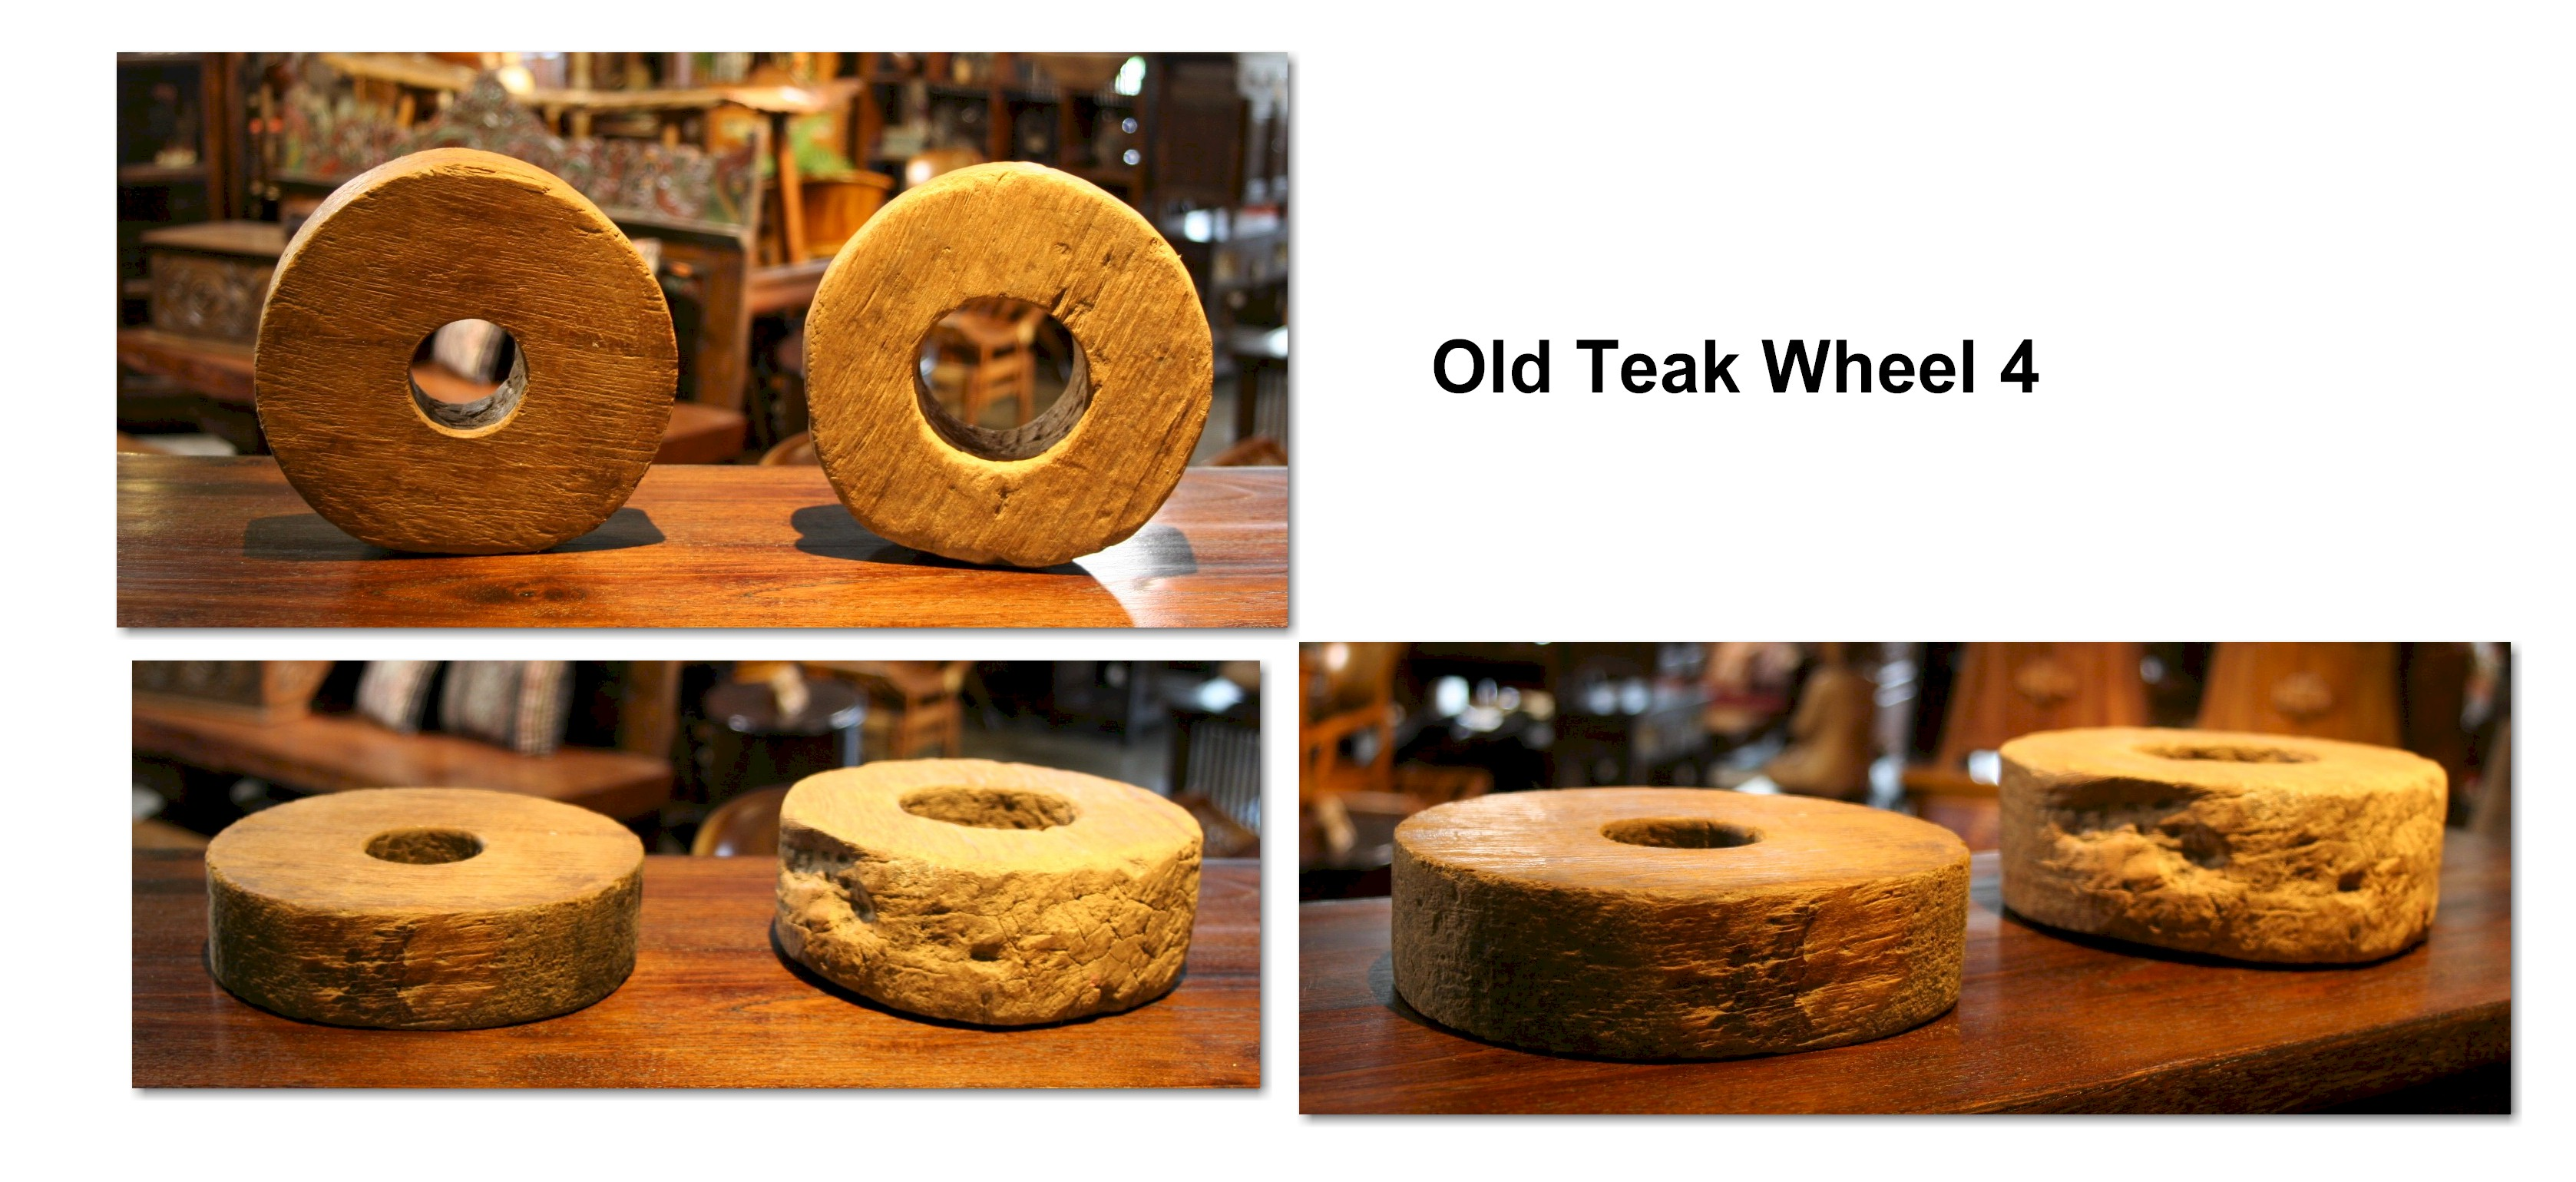 Old Teak Wheel 4